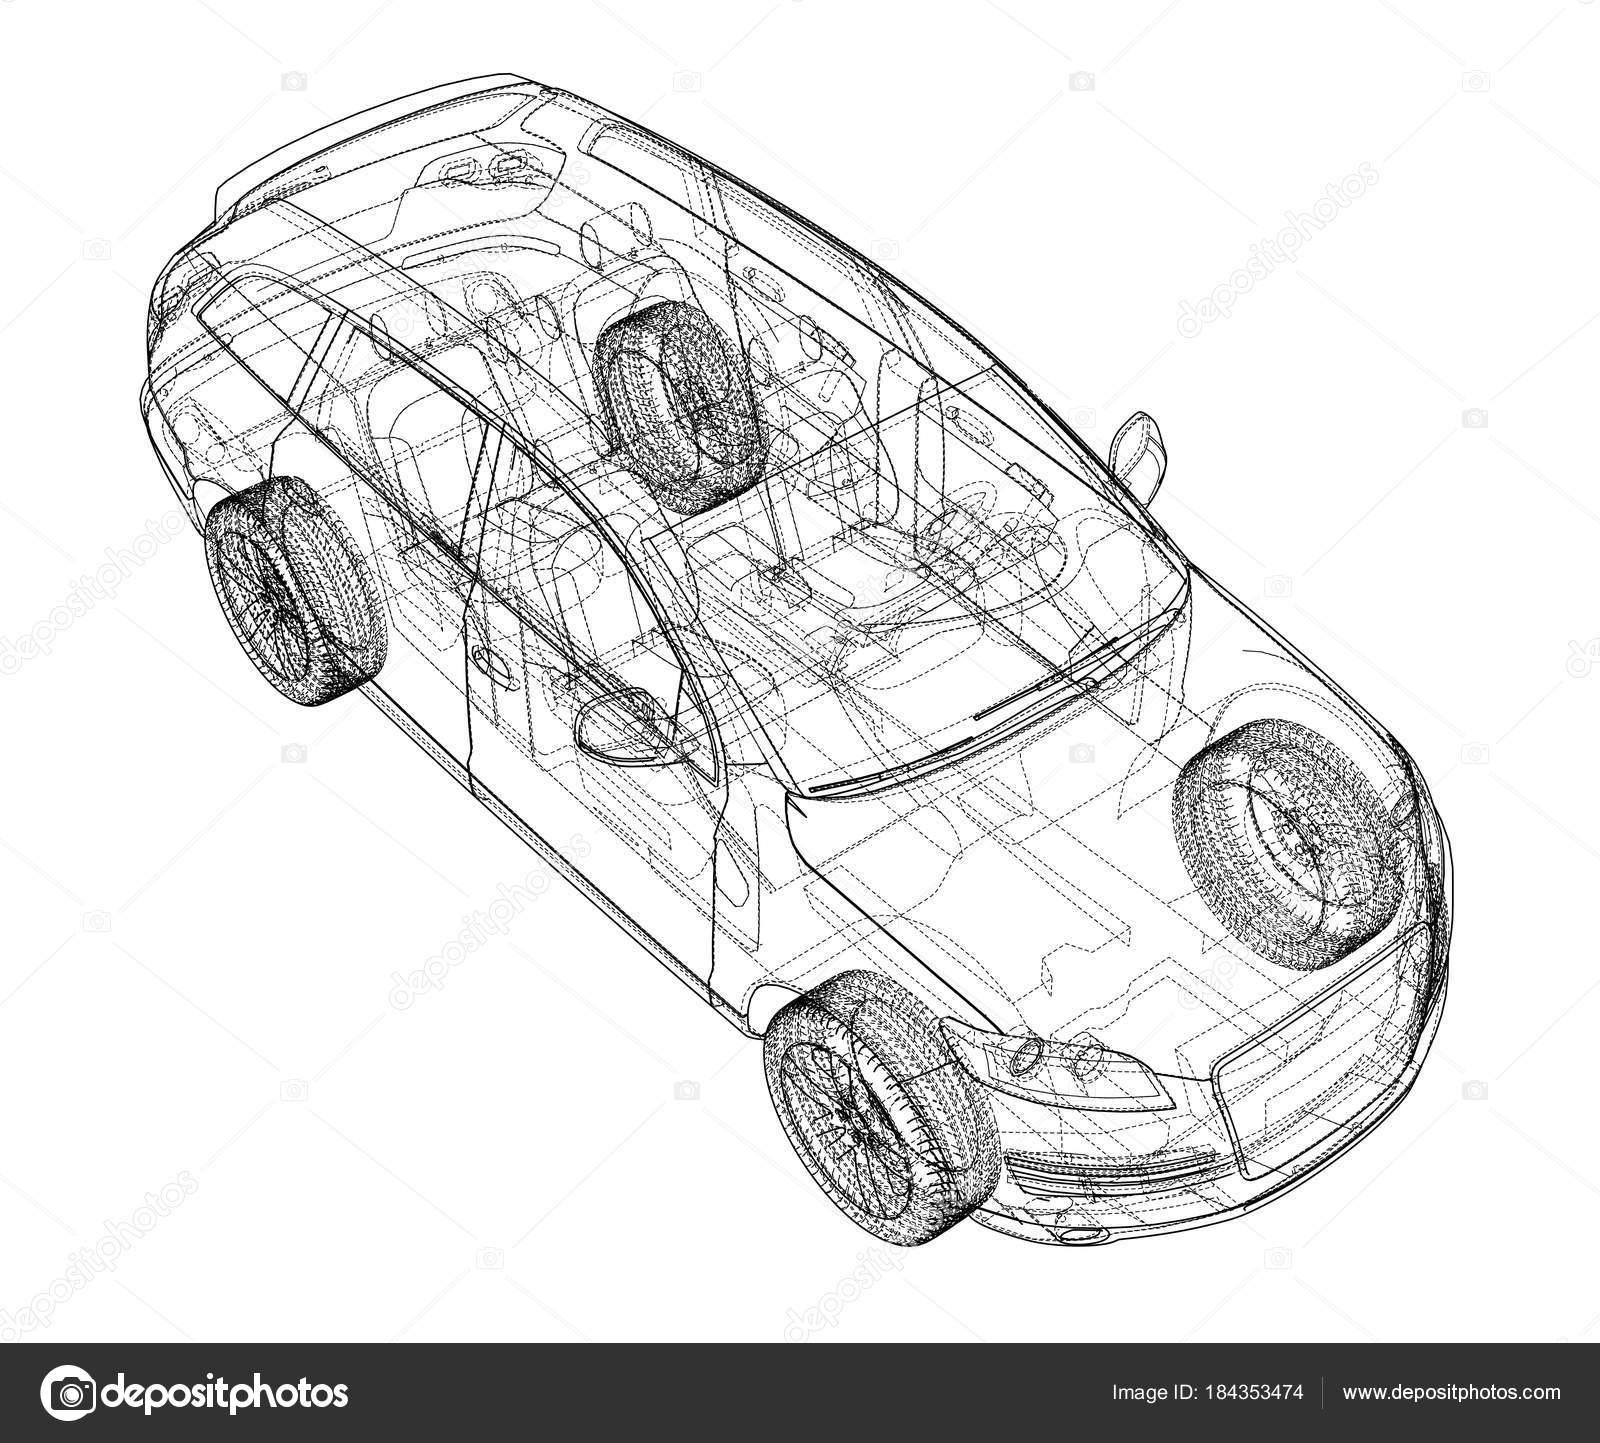 Auto-Skizze. Vektor — Stockvektor © cherezoff #184353474